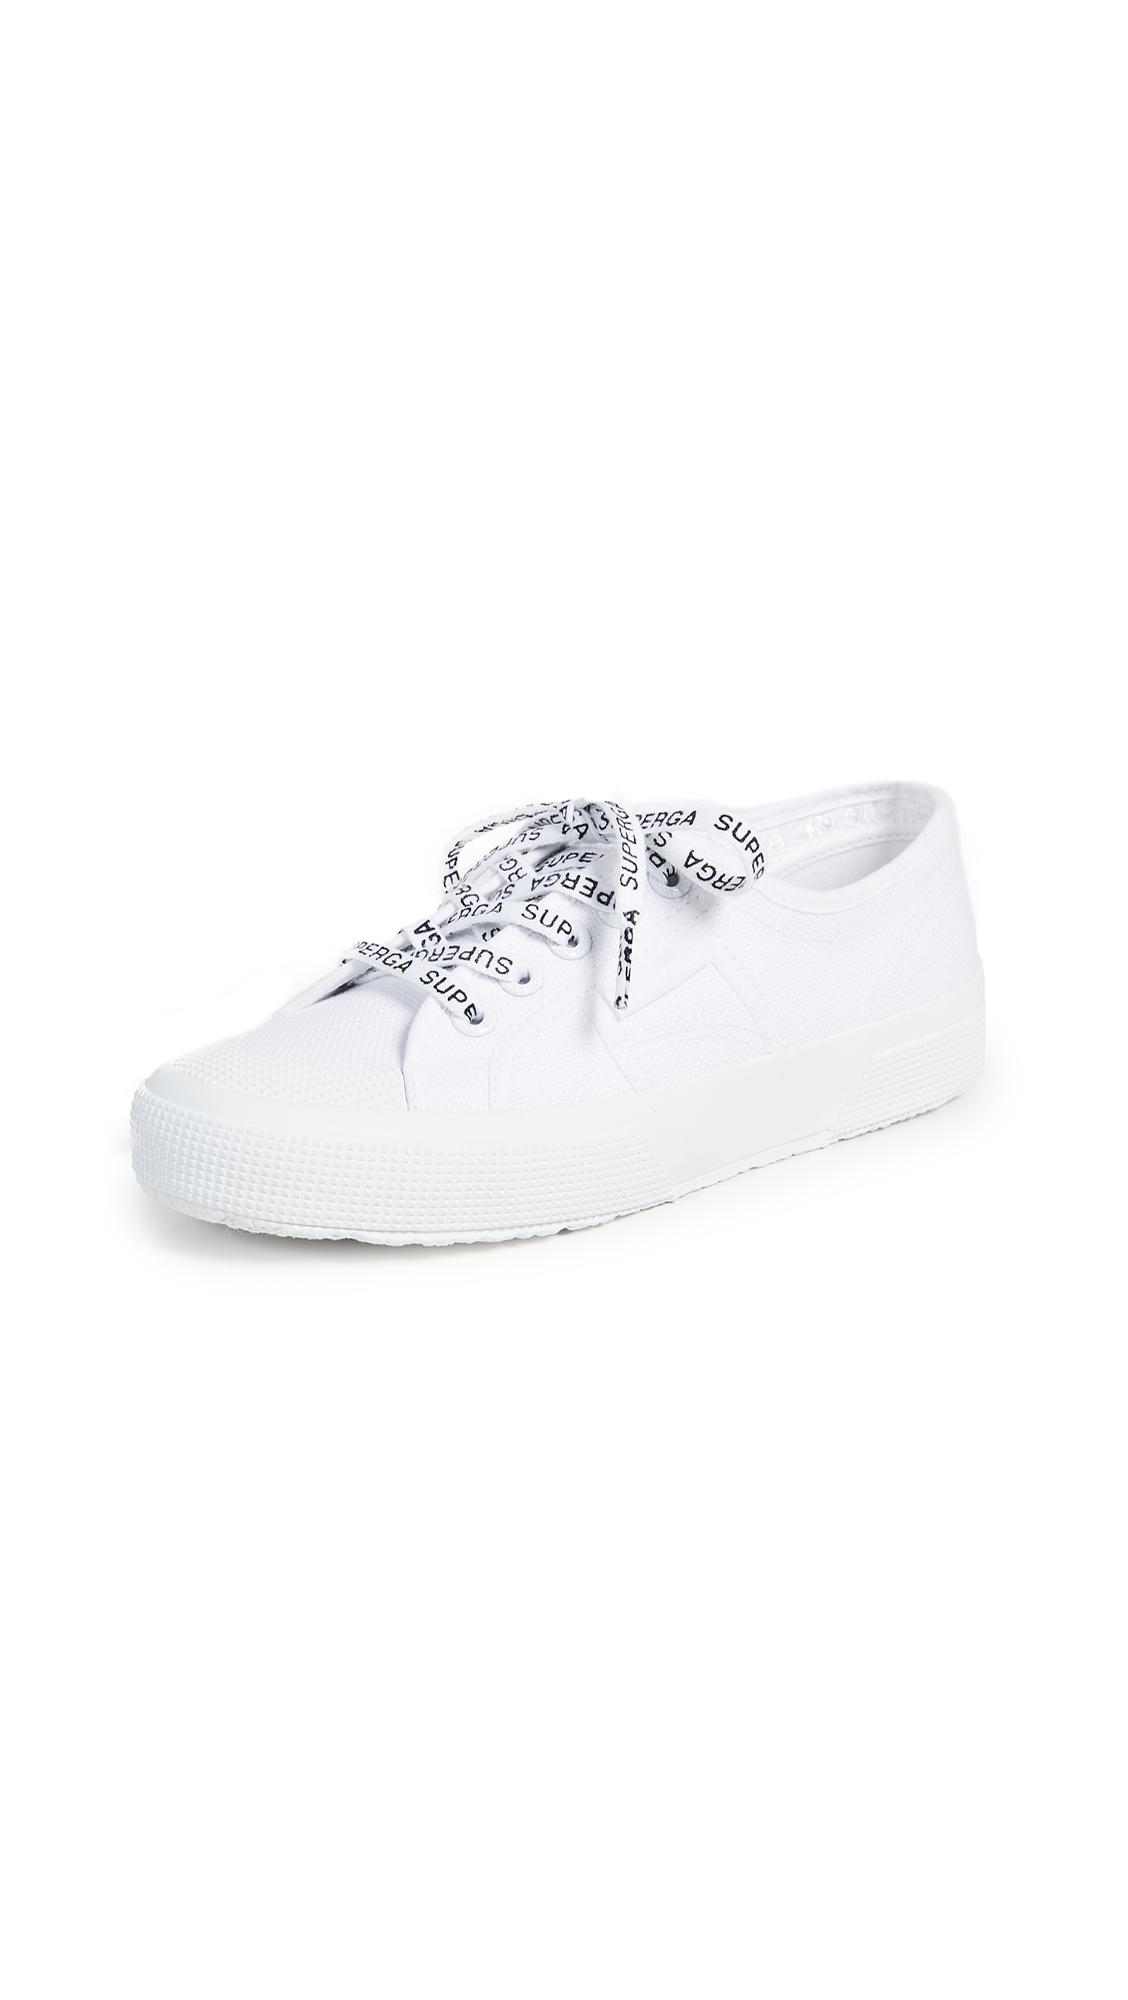 Superga White Out Package Sneakers - White/White